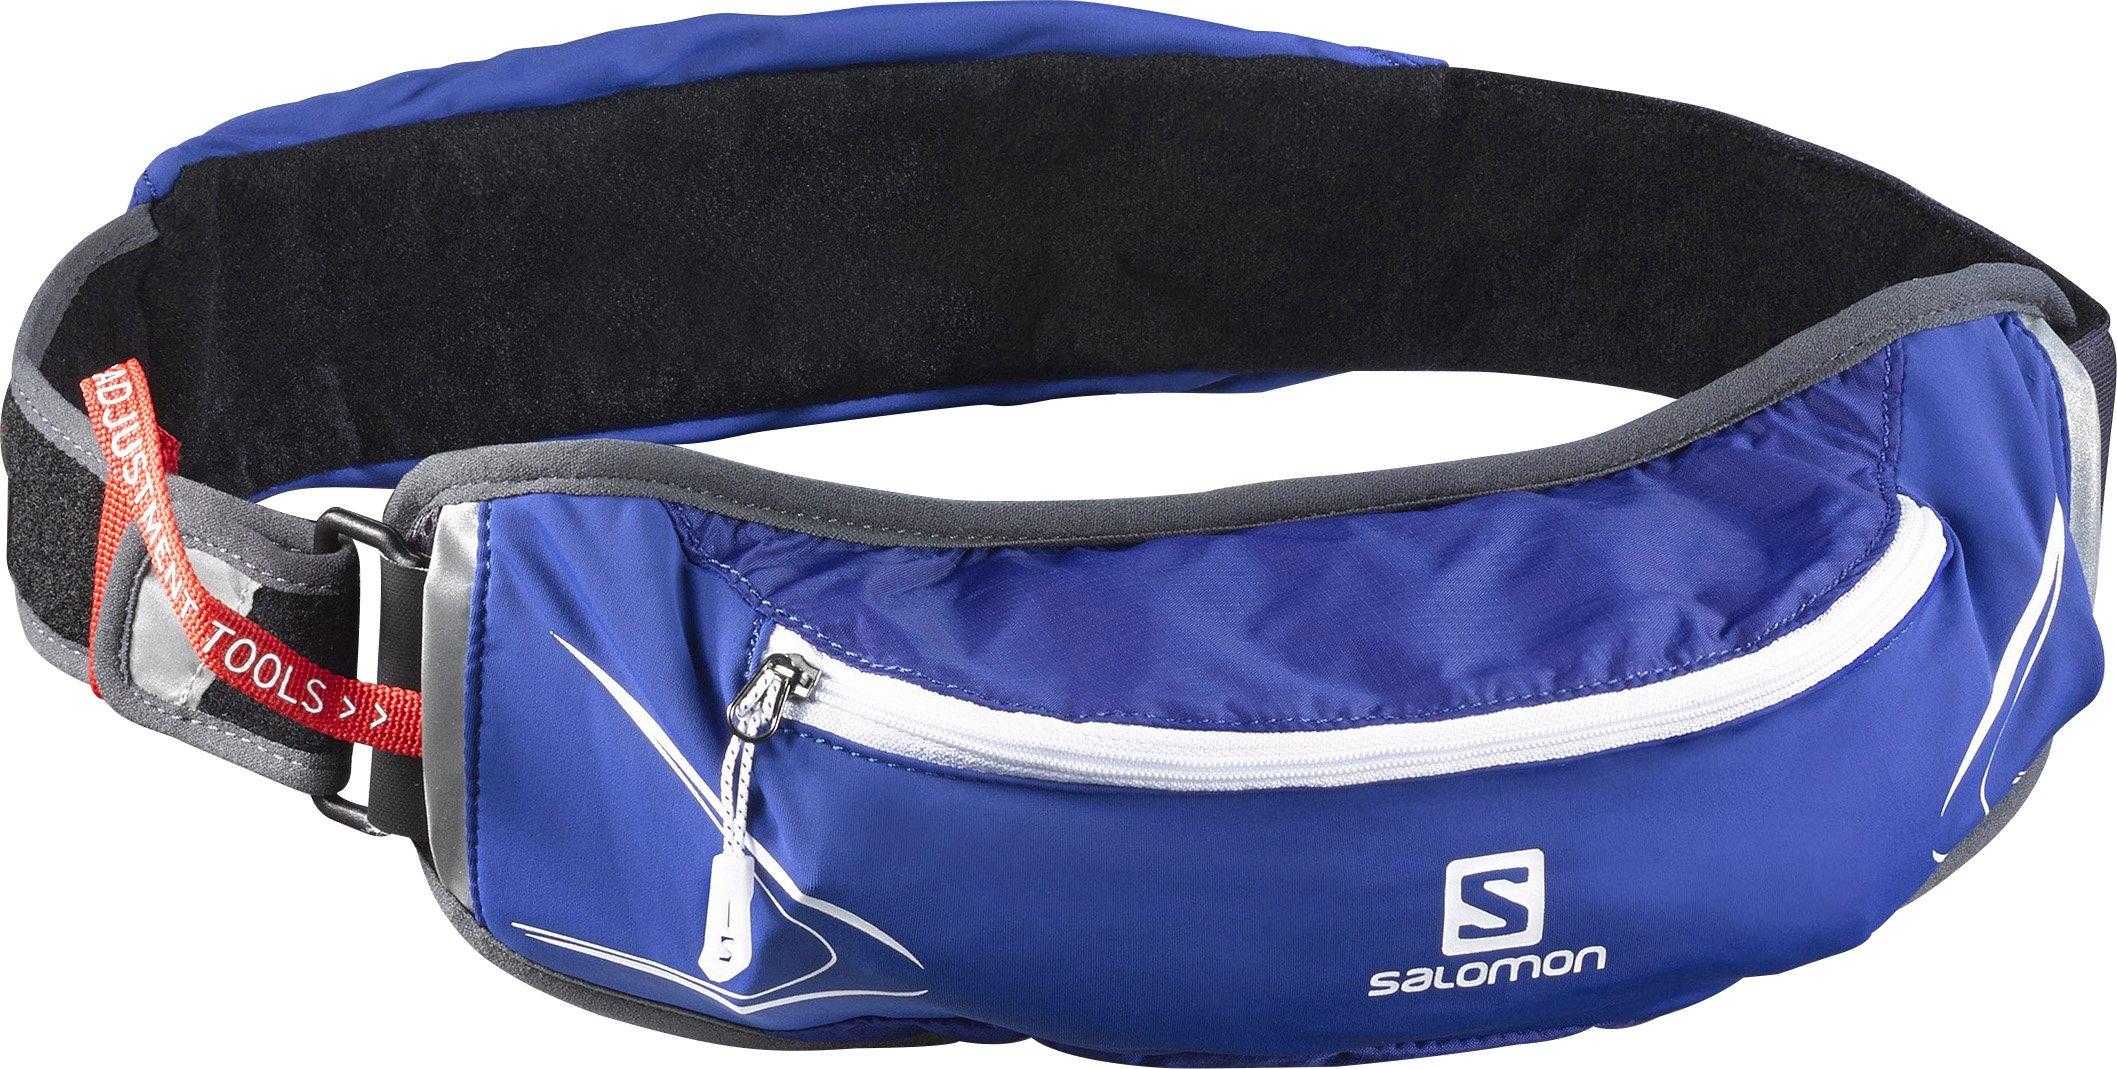 Salomon Agile 500 Belt Set, Surf The Web